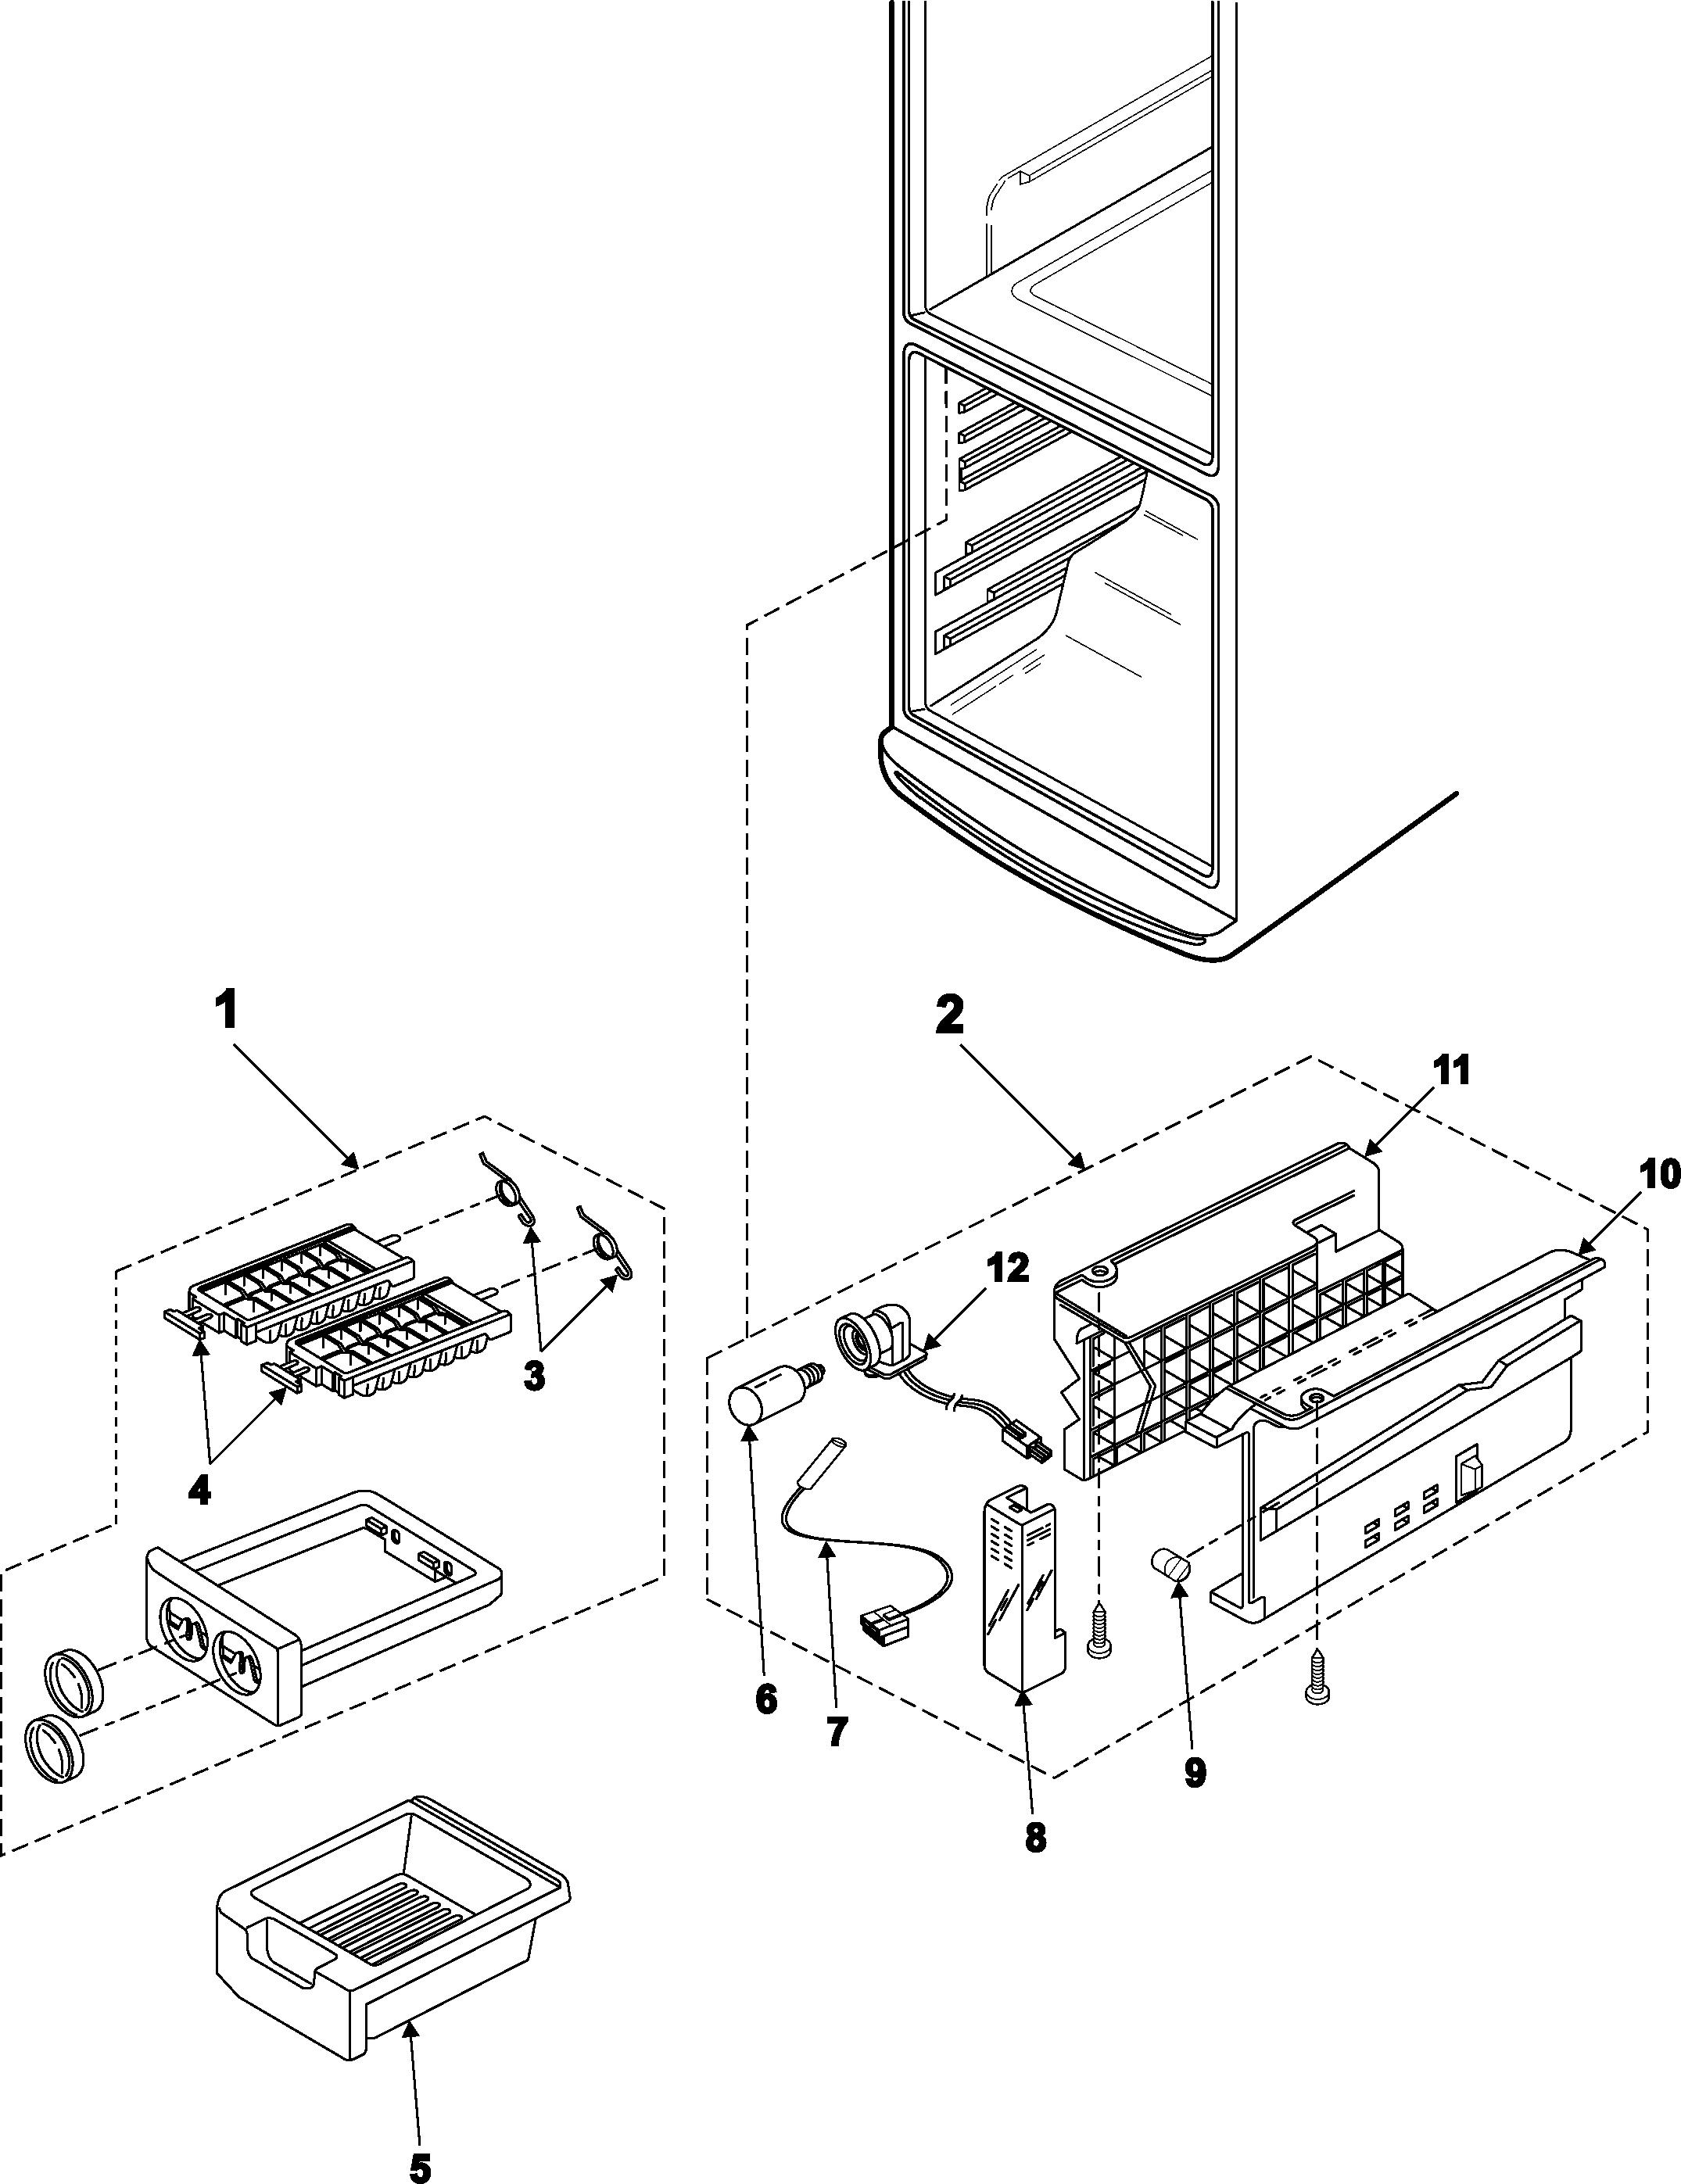 M0612100 00008?resize\=665%2C864 ge gfe28hshss wiring diagram ge motor wiring diagram \u2022 indy500 co ge refrigerator wiring diagram problem at gsmx.co